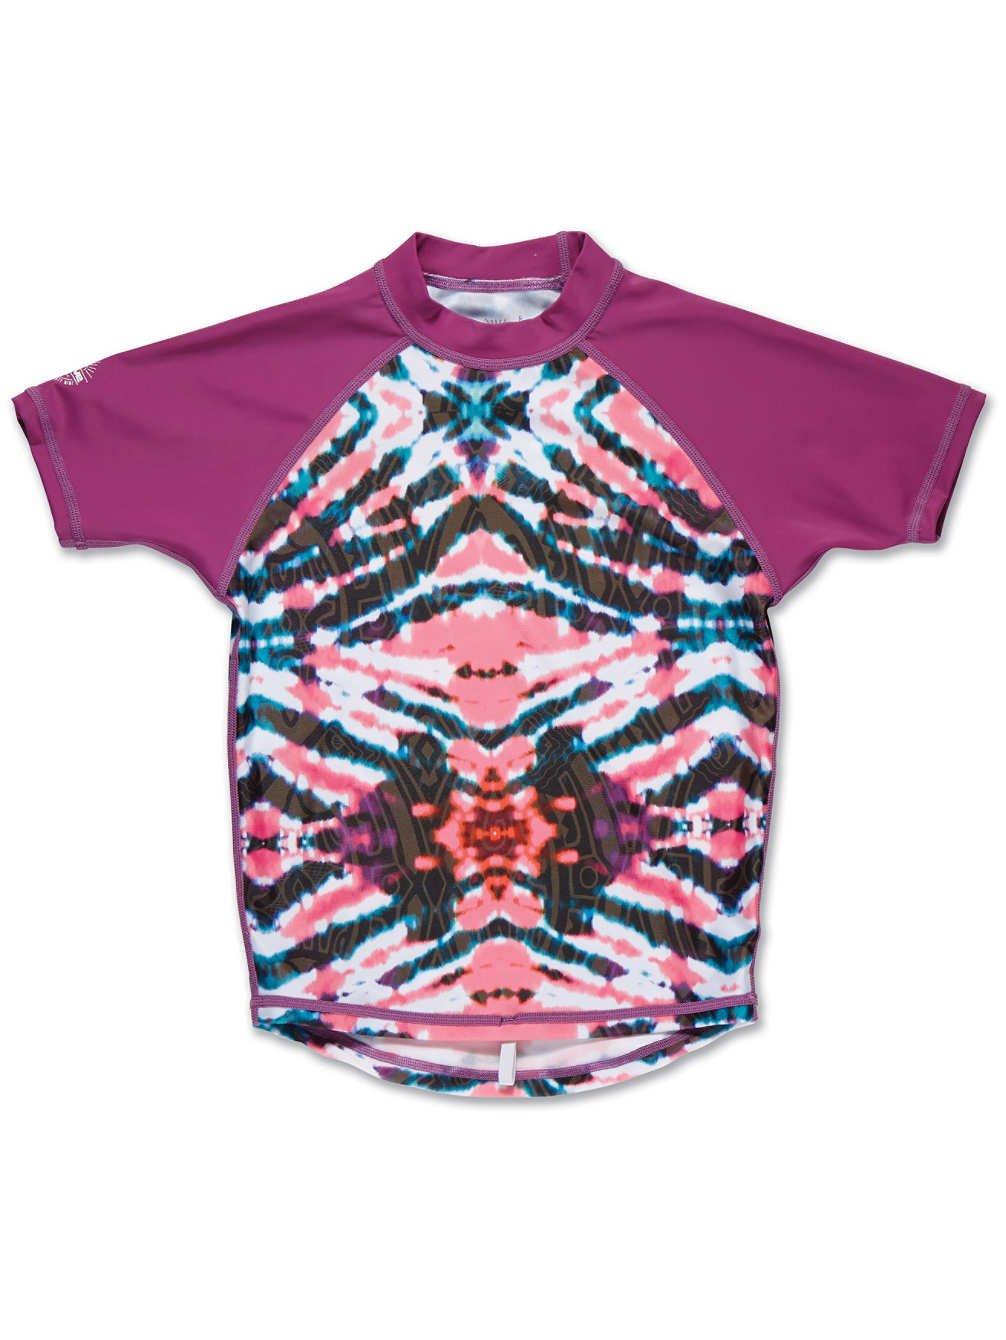 Dakine Girl's Classic Short Sleeve Rashguard Shirt, Watermelon Burst, 12